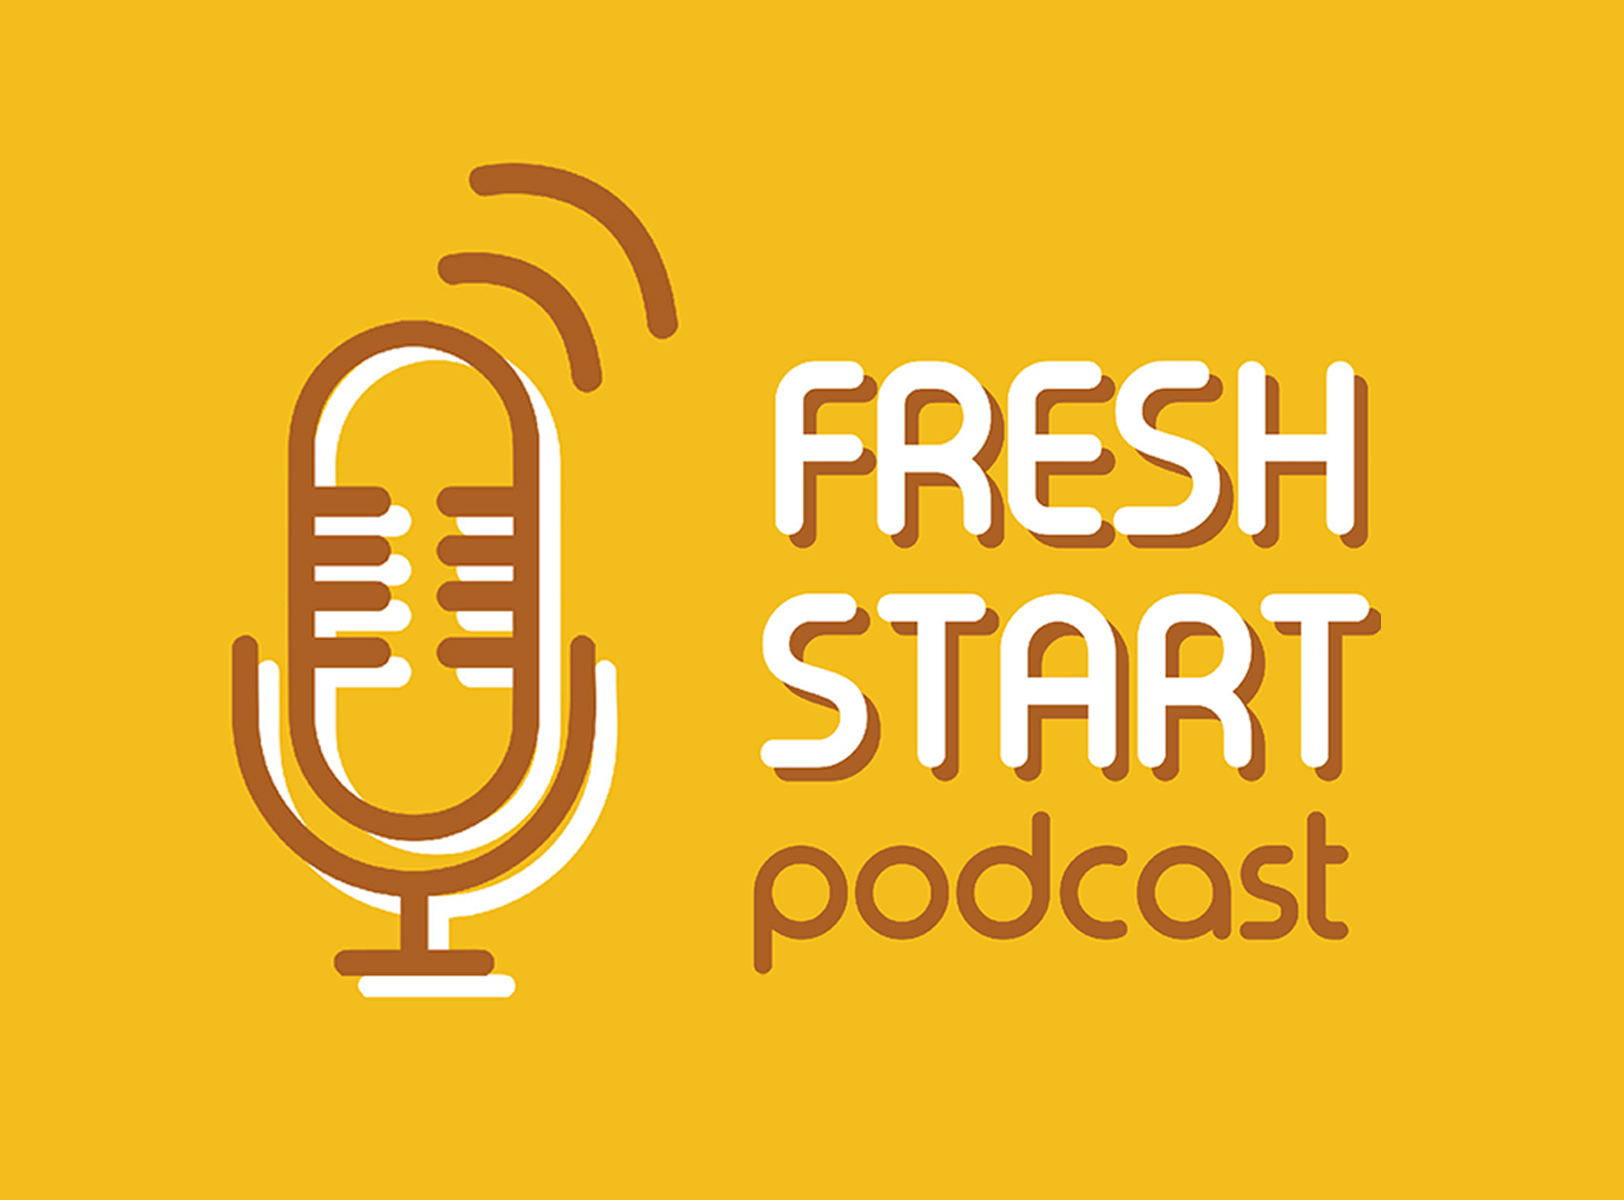 Fresh Start: Podcast News (8/5/2019 Mon.)